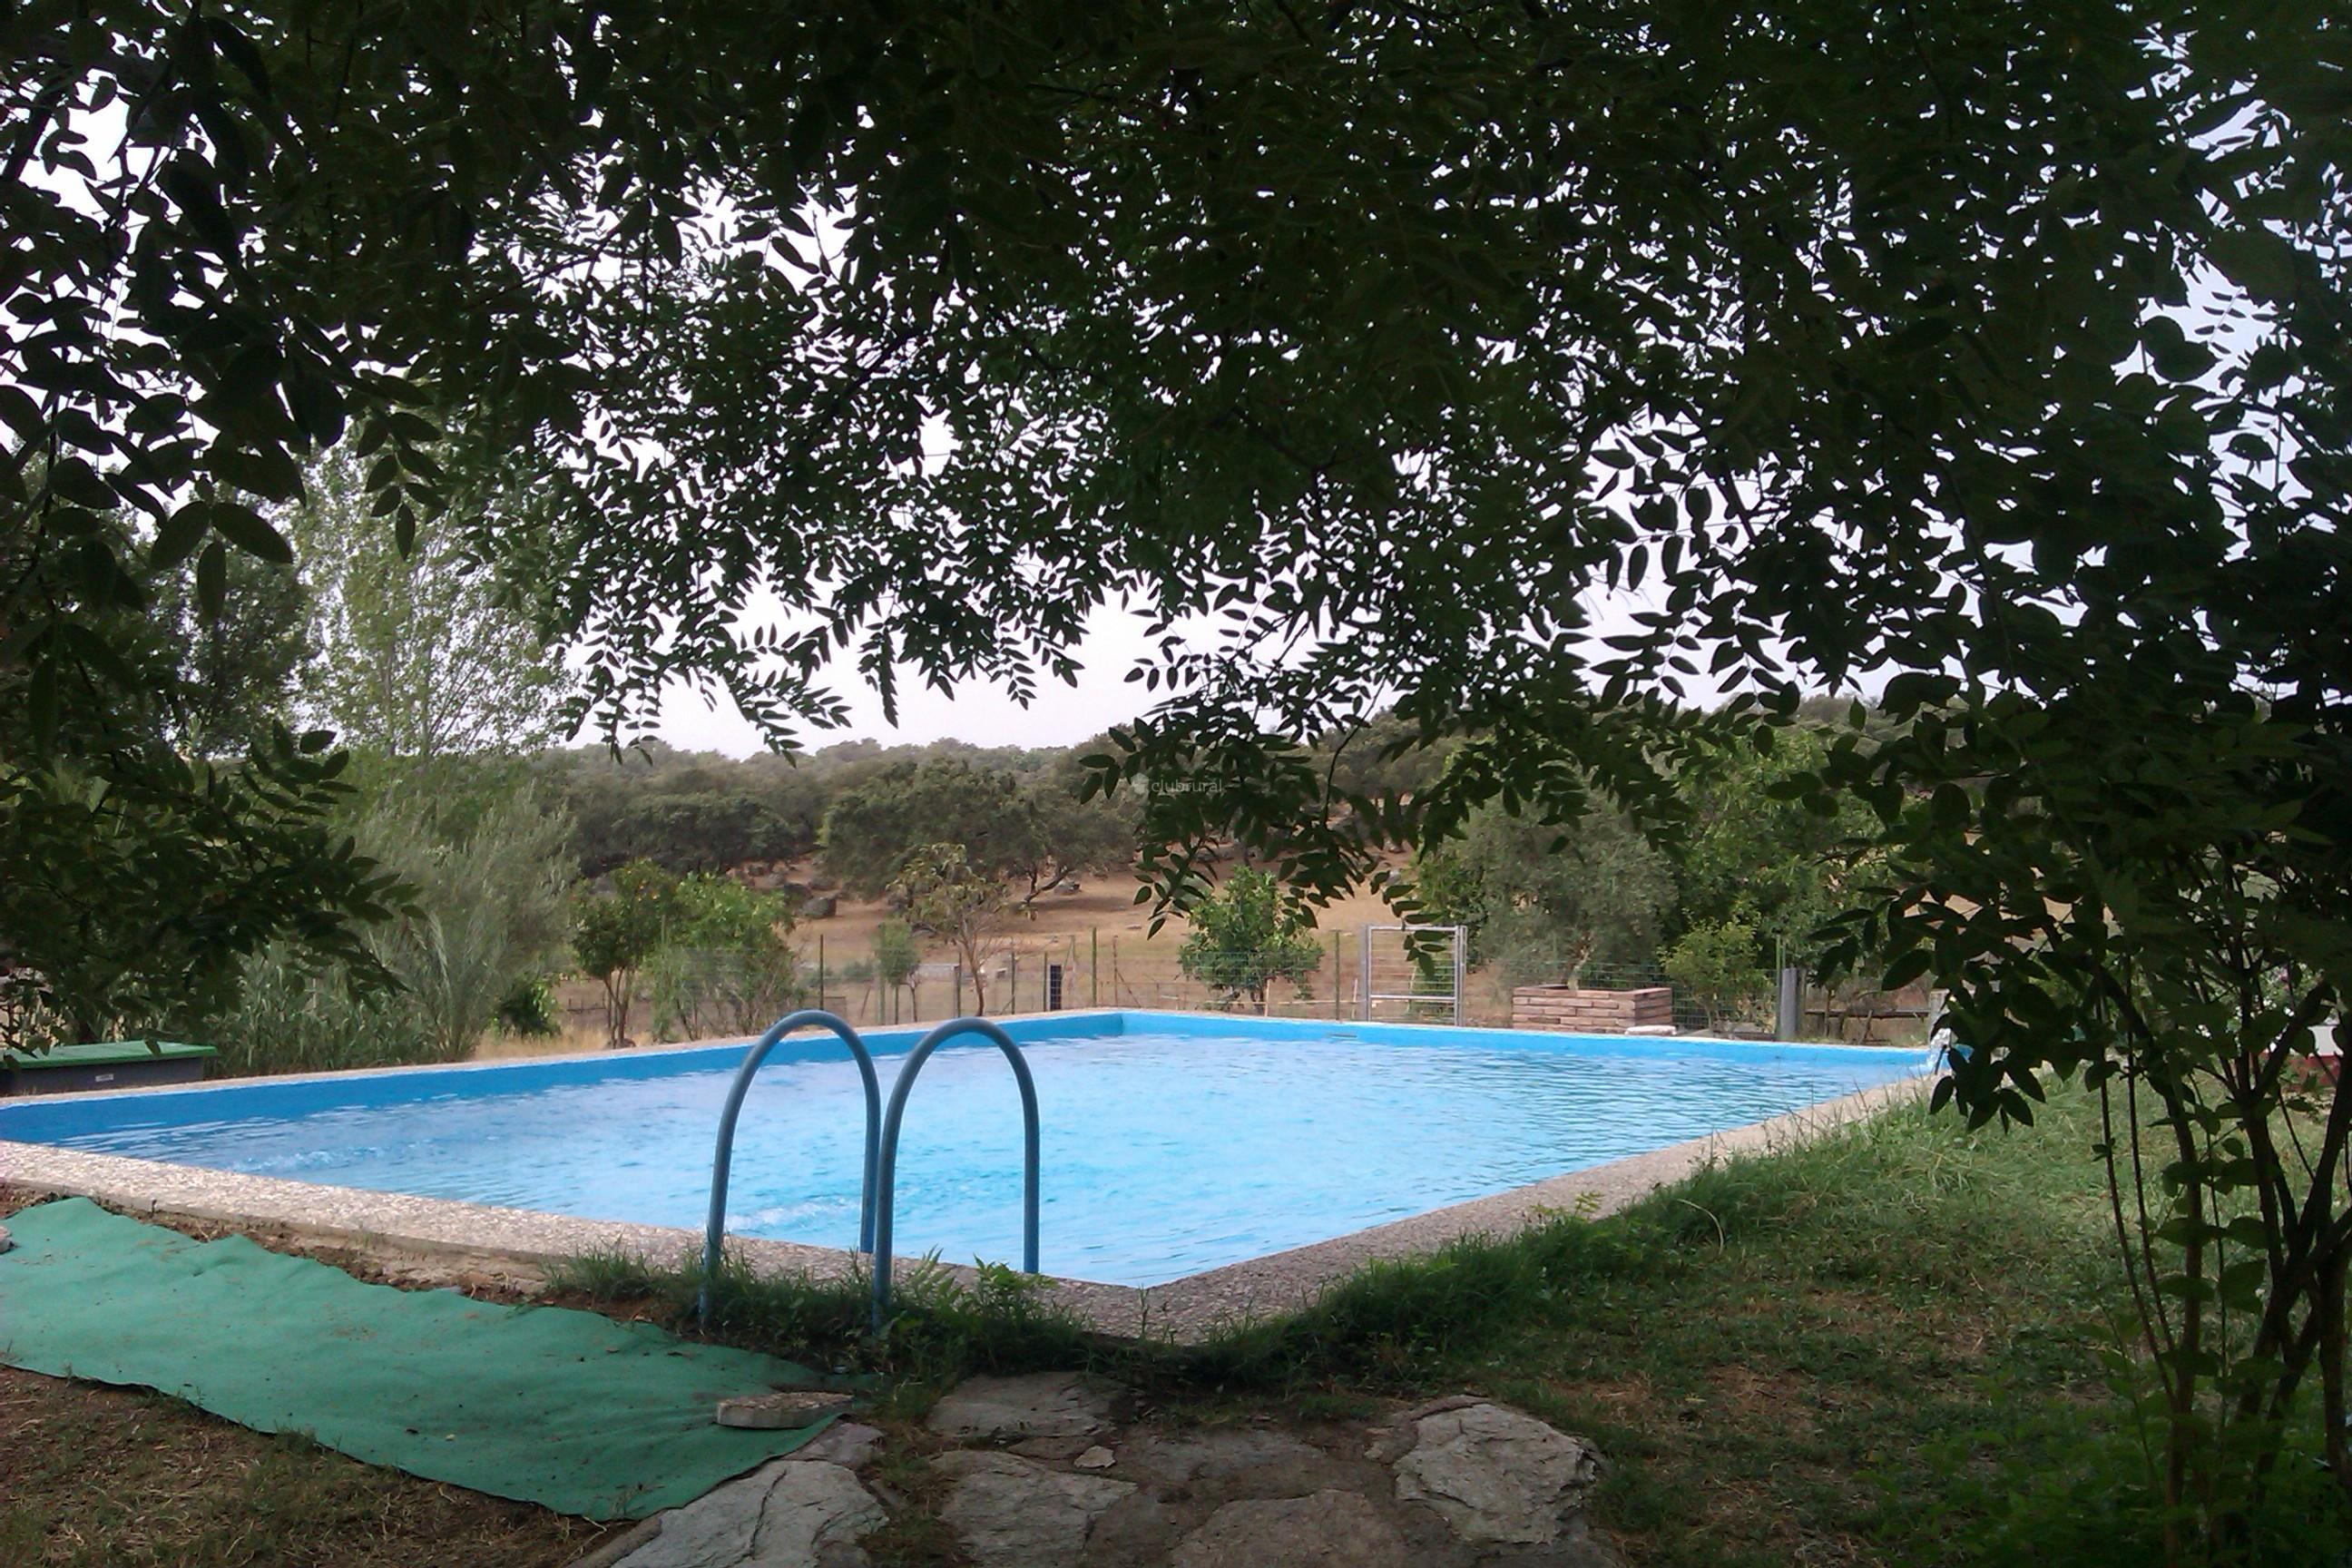 Fotos de huerta de los sevillanos sevilla el pedroso for Casa rural sevilla piscina